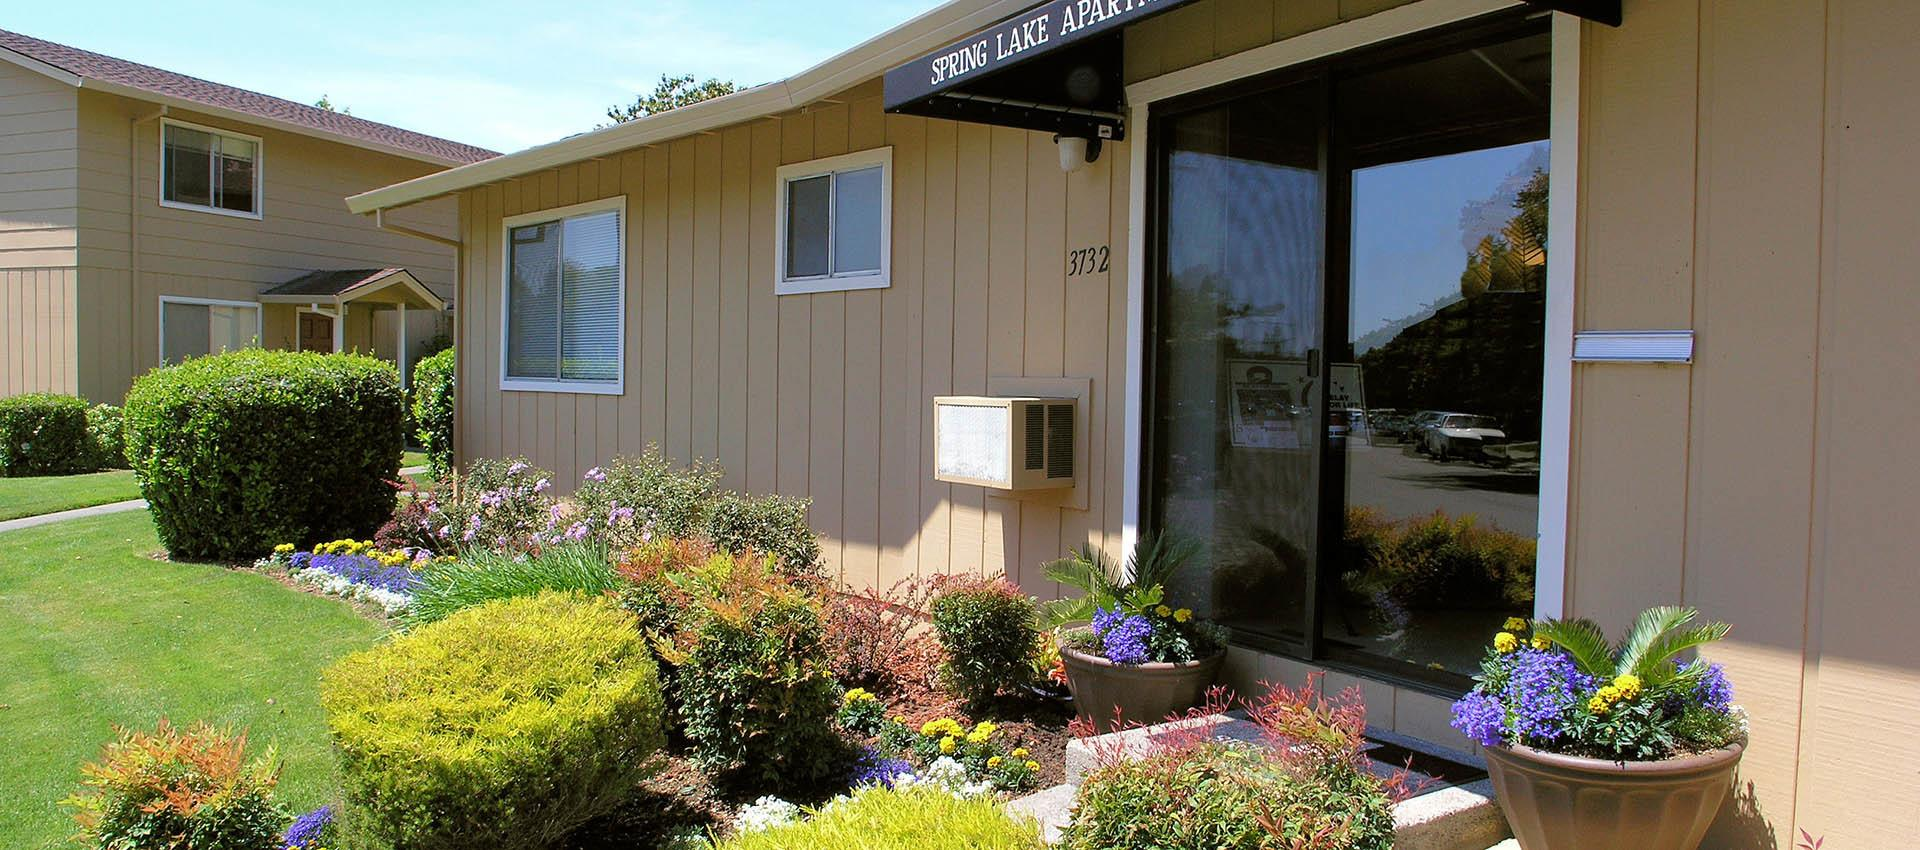 Leasing office at apartments in Santa Rosa, CA